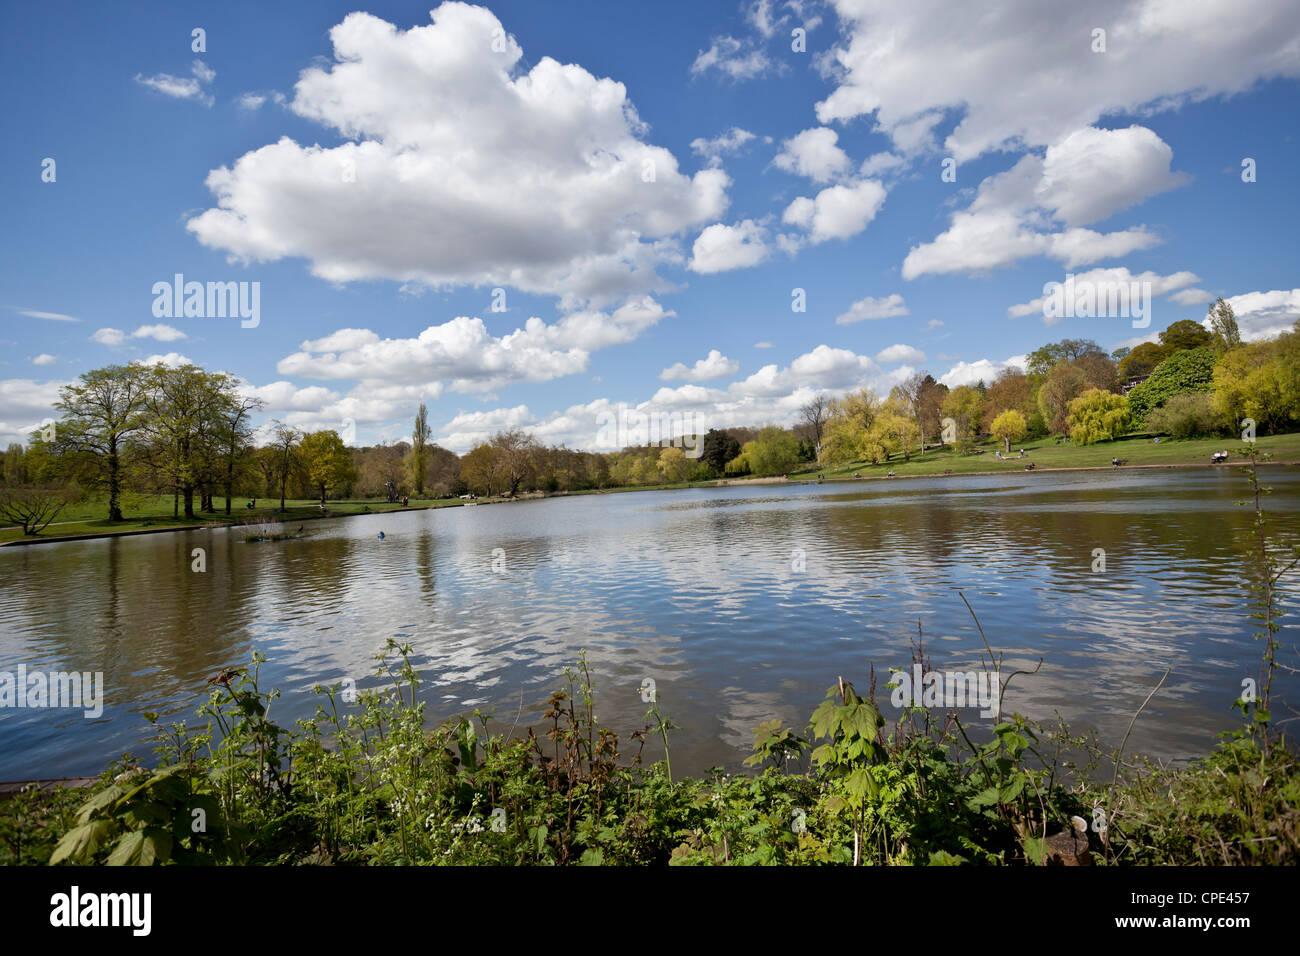 Hampstead Heath, London, England, UK - Stock Image